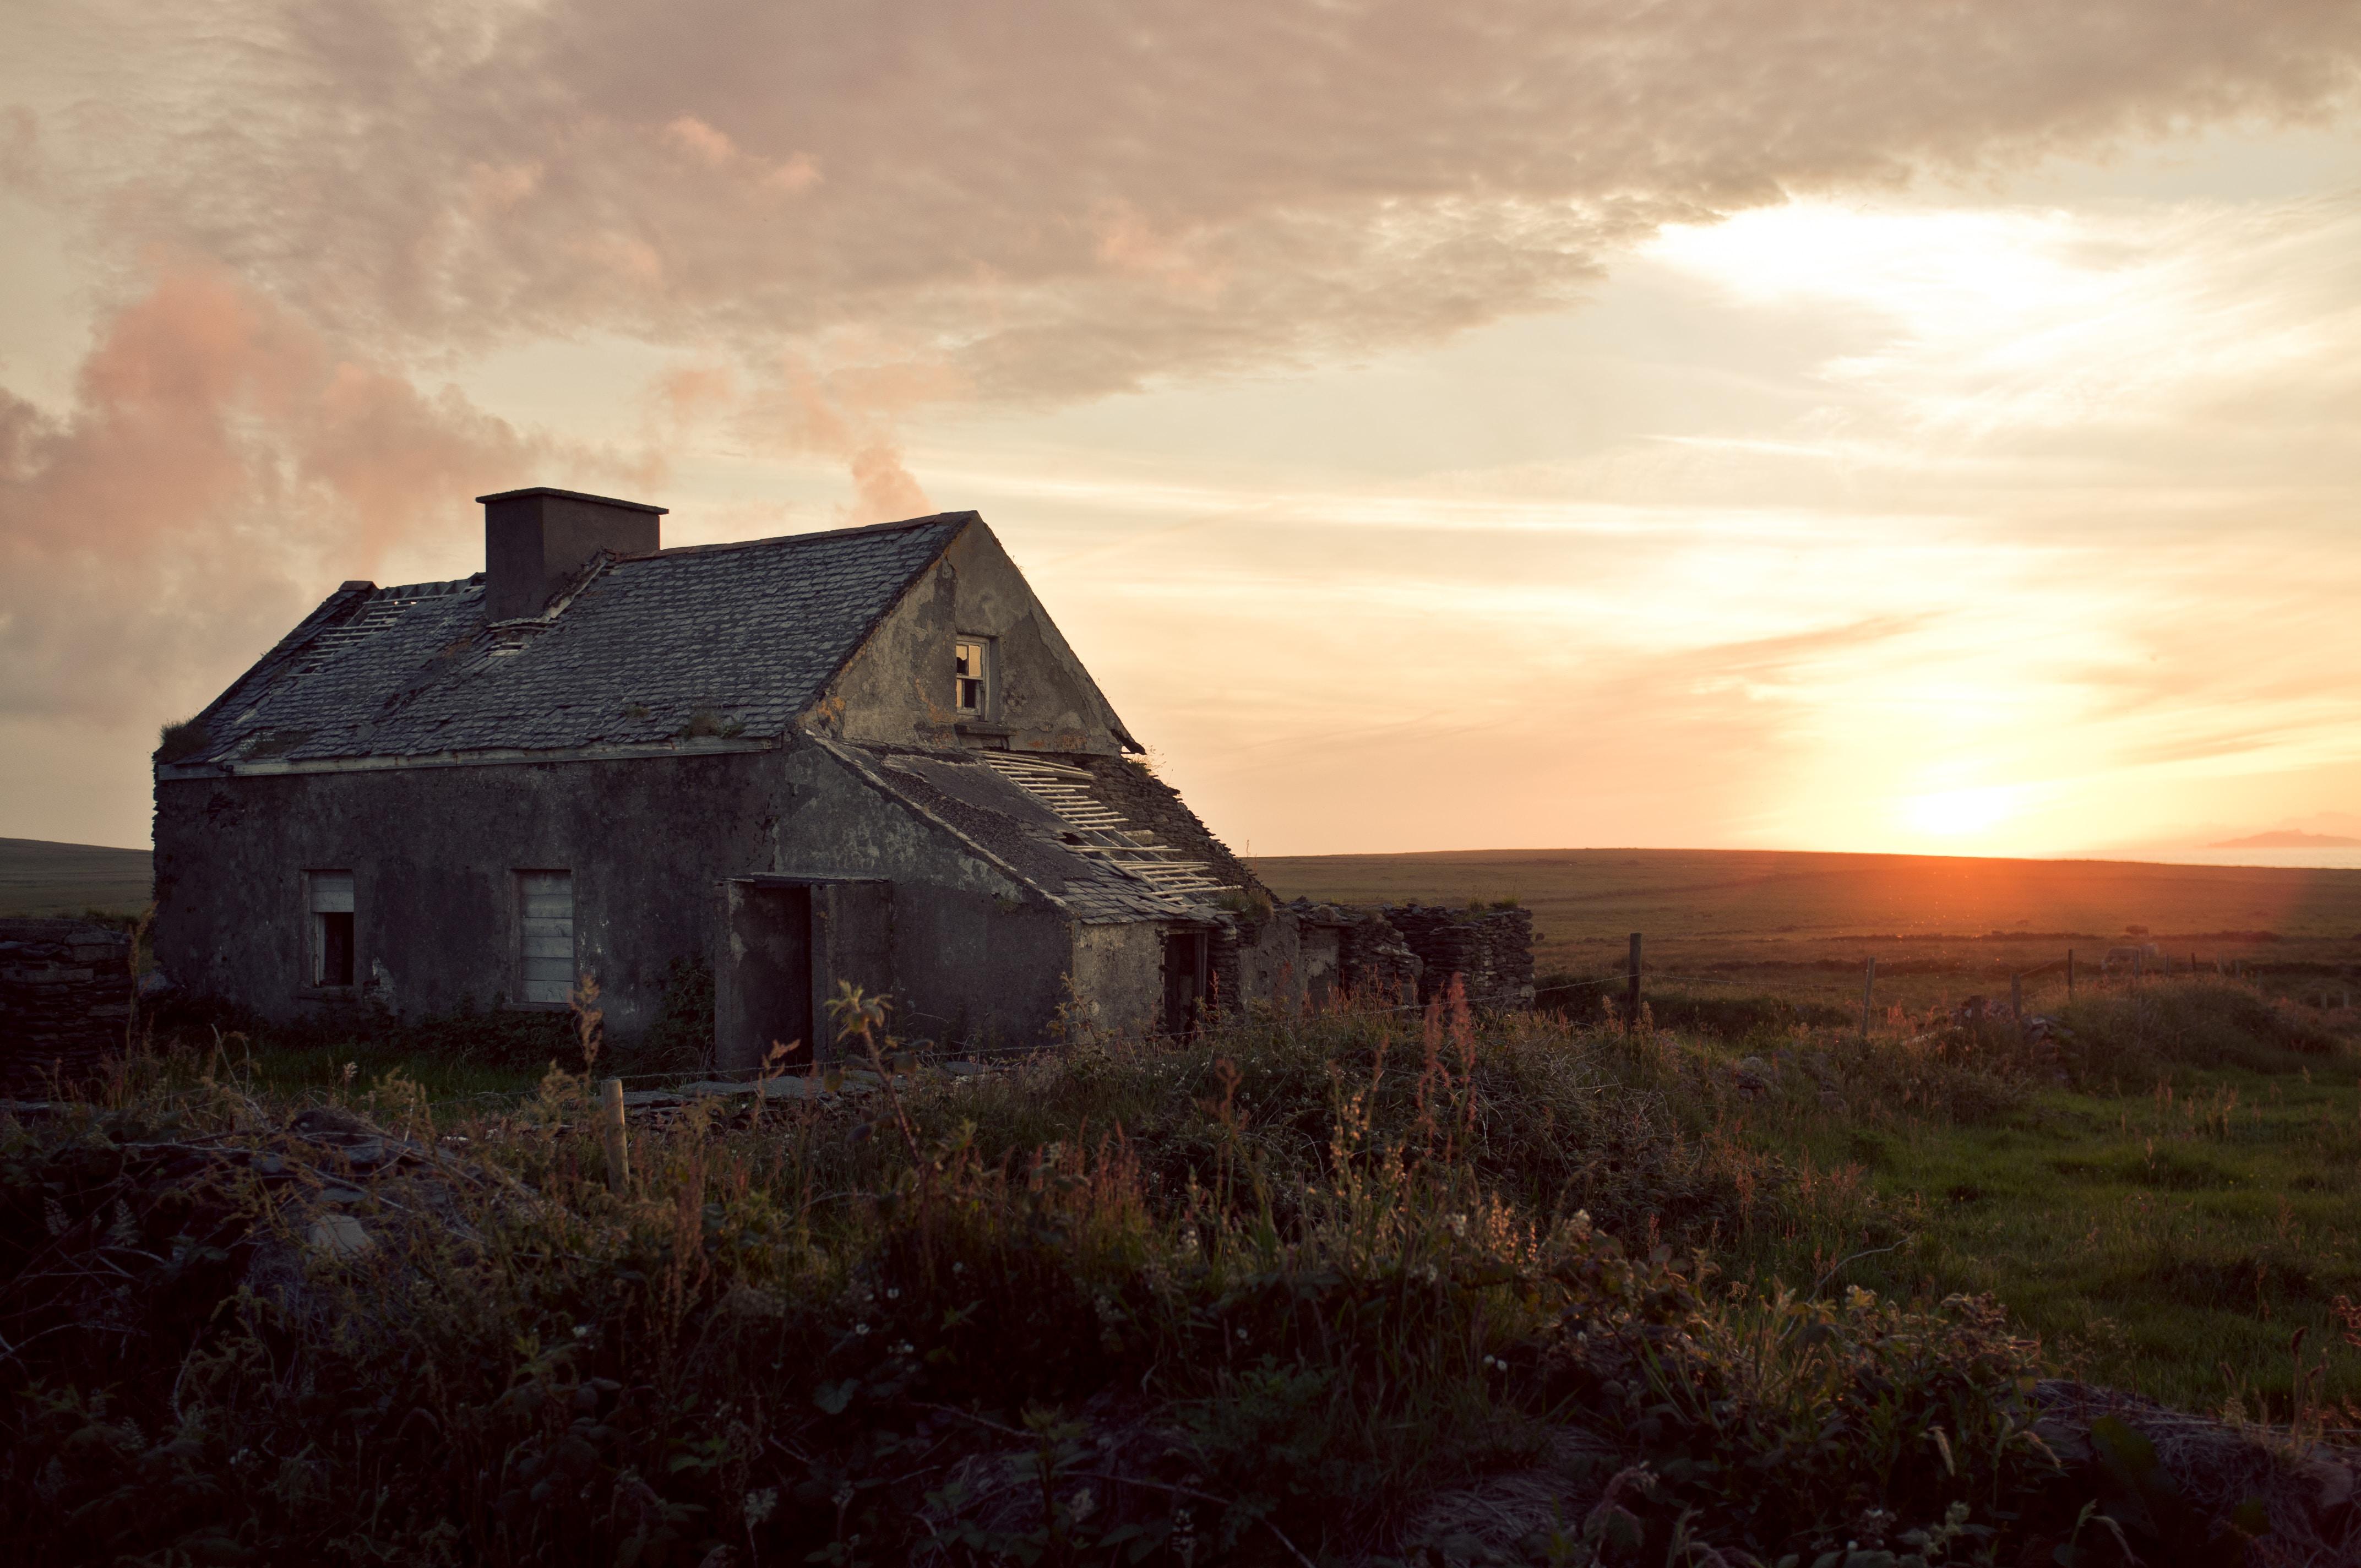 scenery of sunset